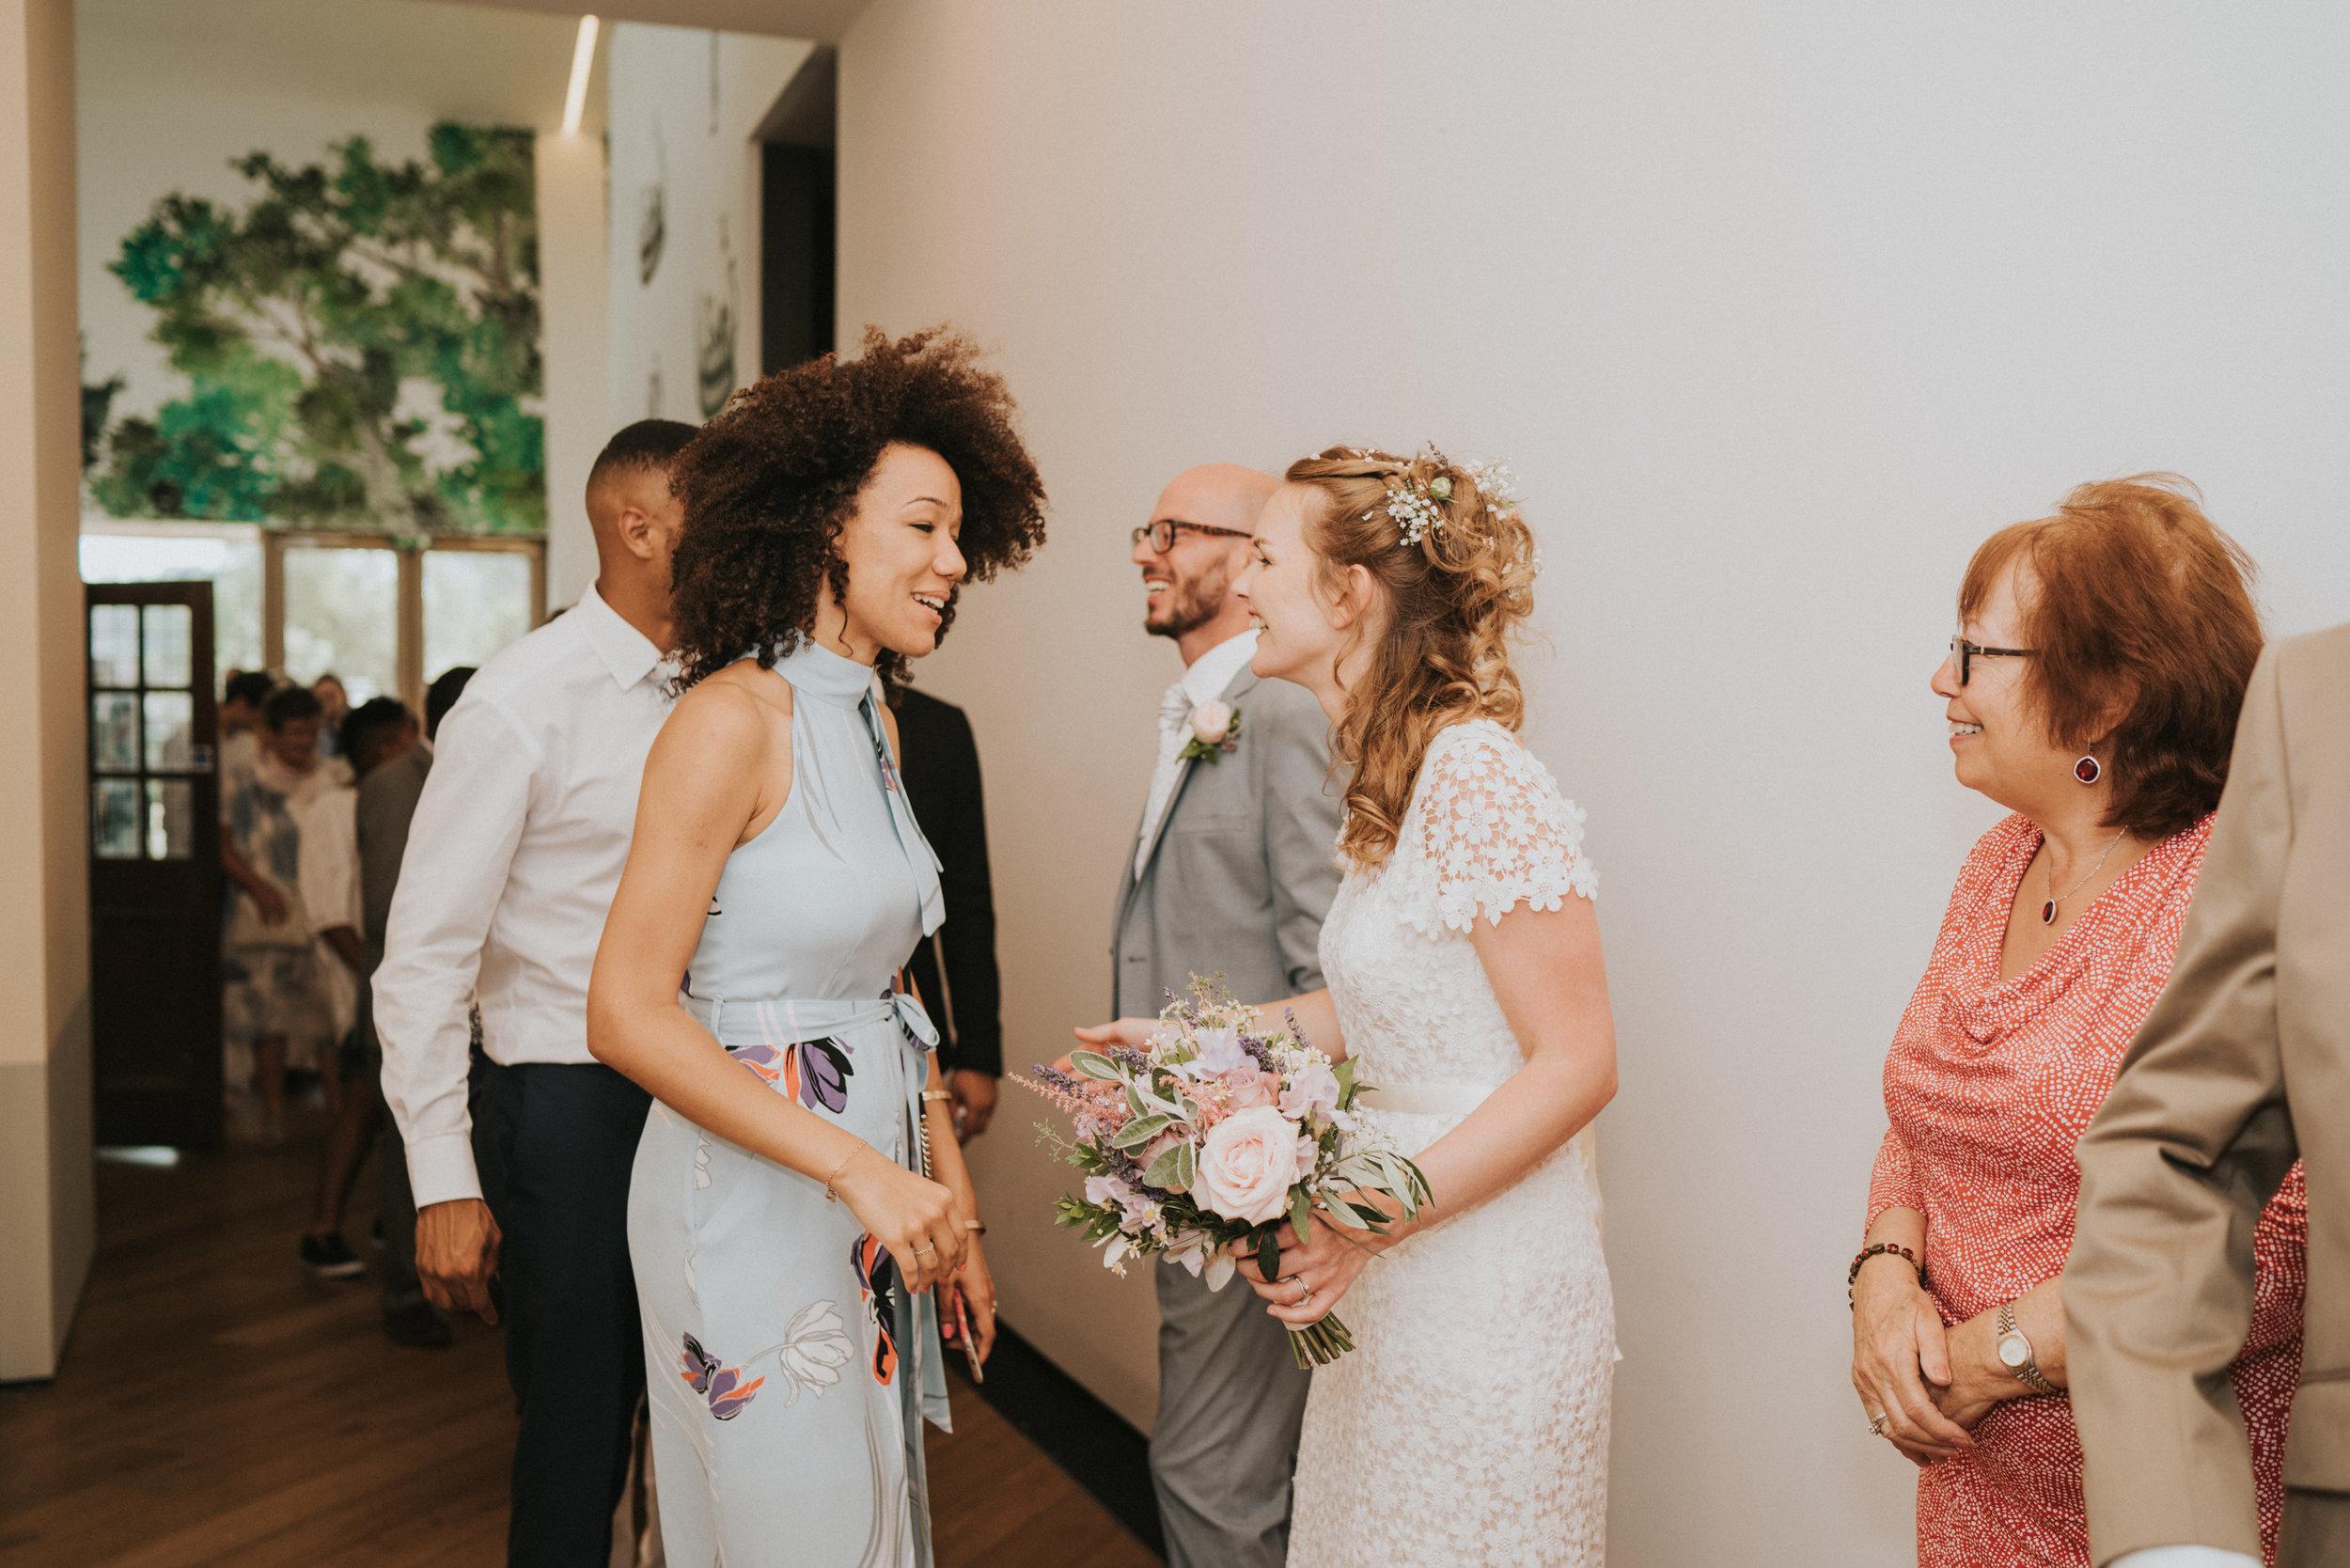 Grace-Elizabeth-Georgie-Amalaketu-Firstsite-Colchester-Essex-Boho-Buddhist-Wedding-Alternative-Wedding-Photography-Essex (95 of 100).jpg